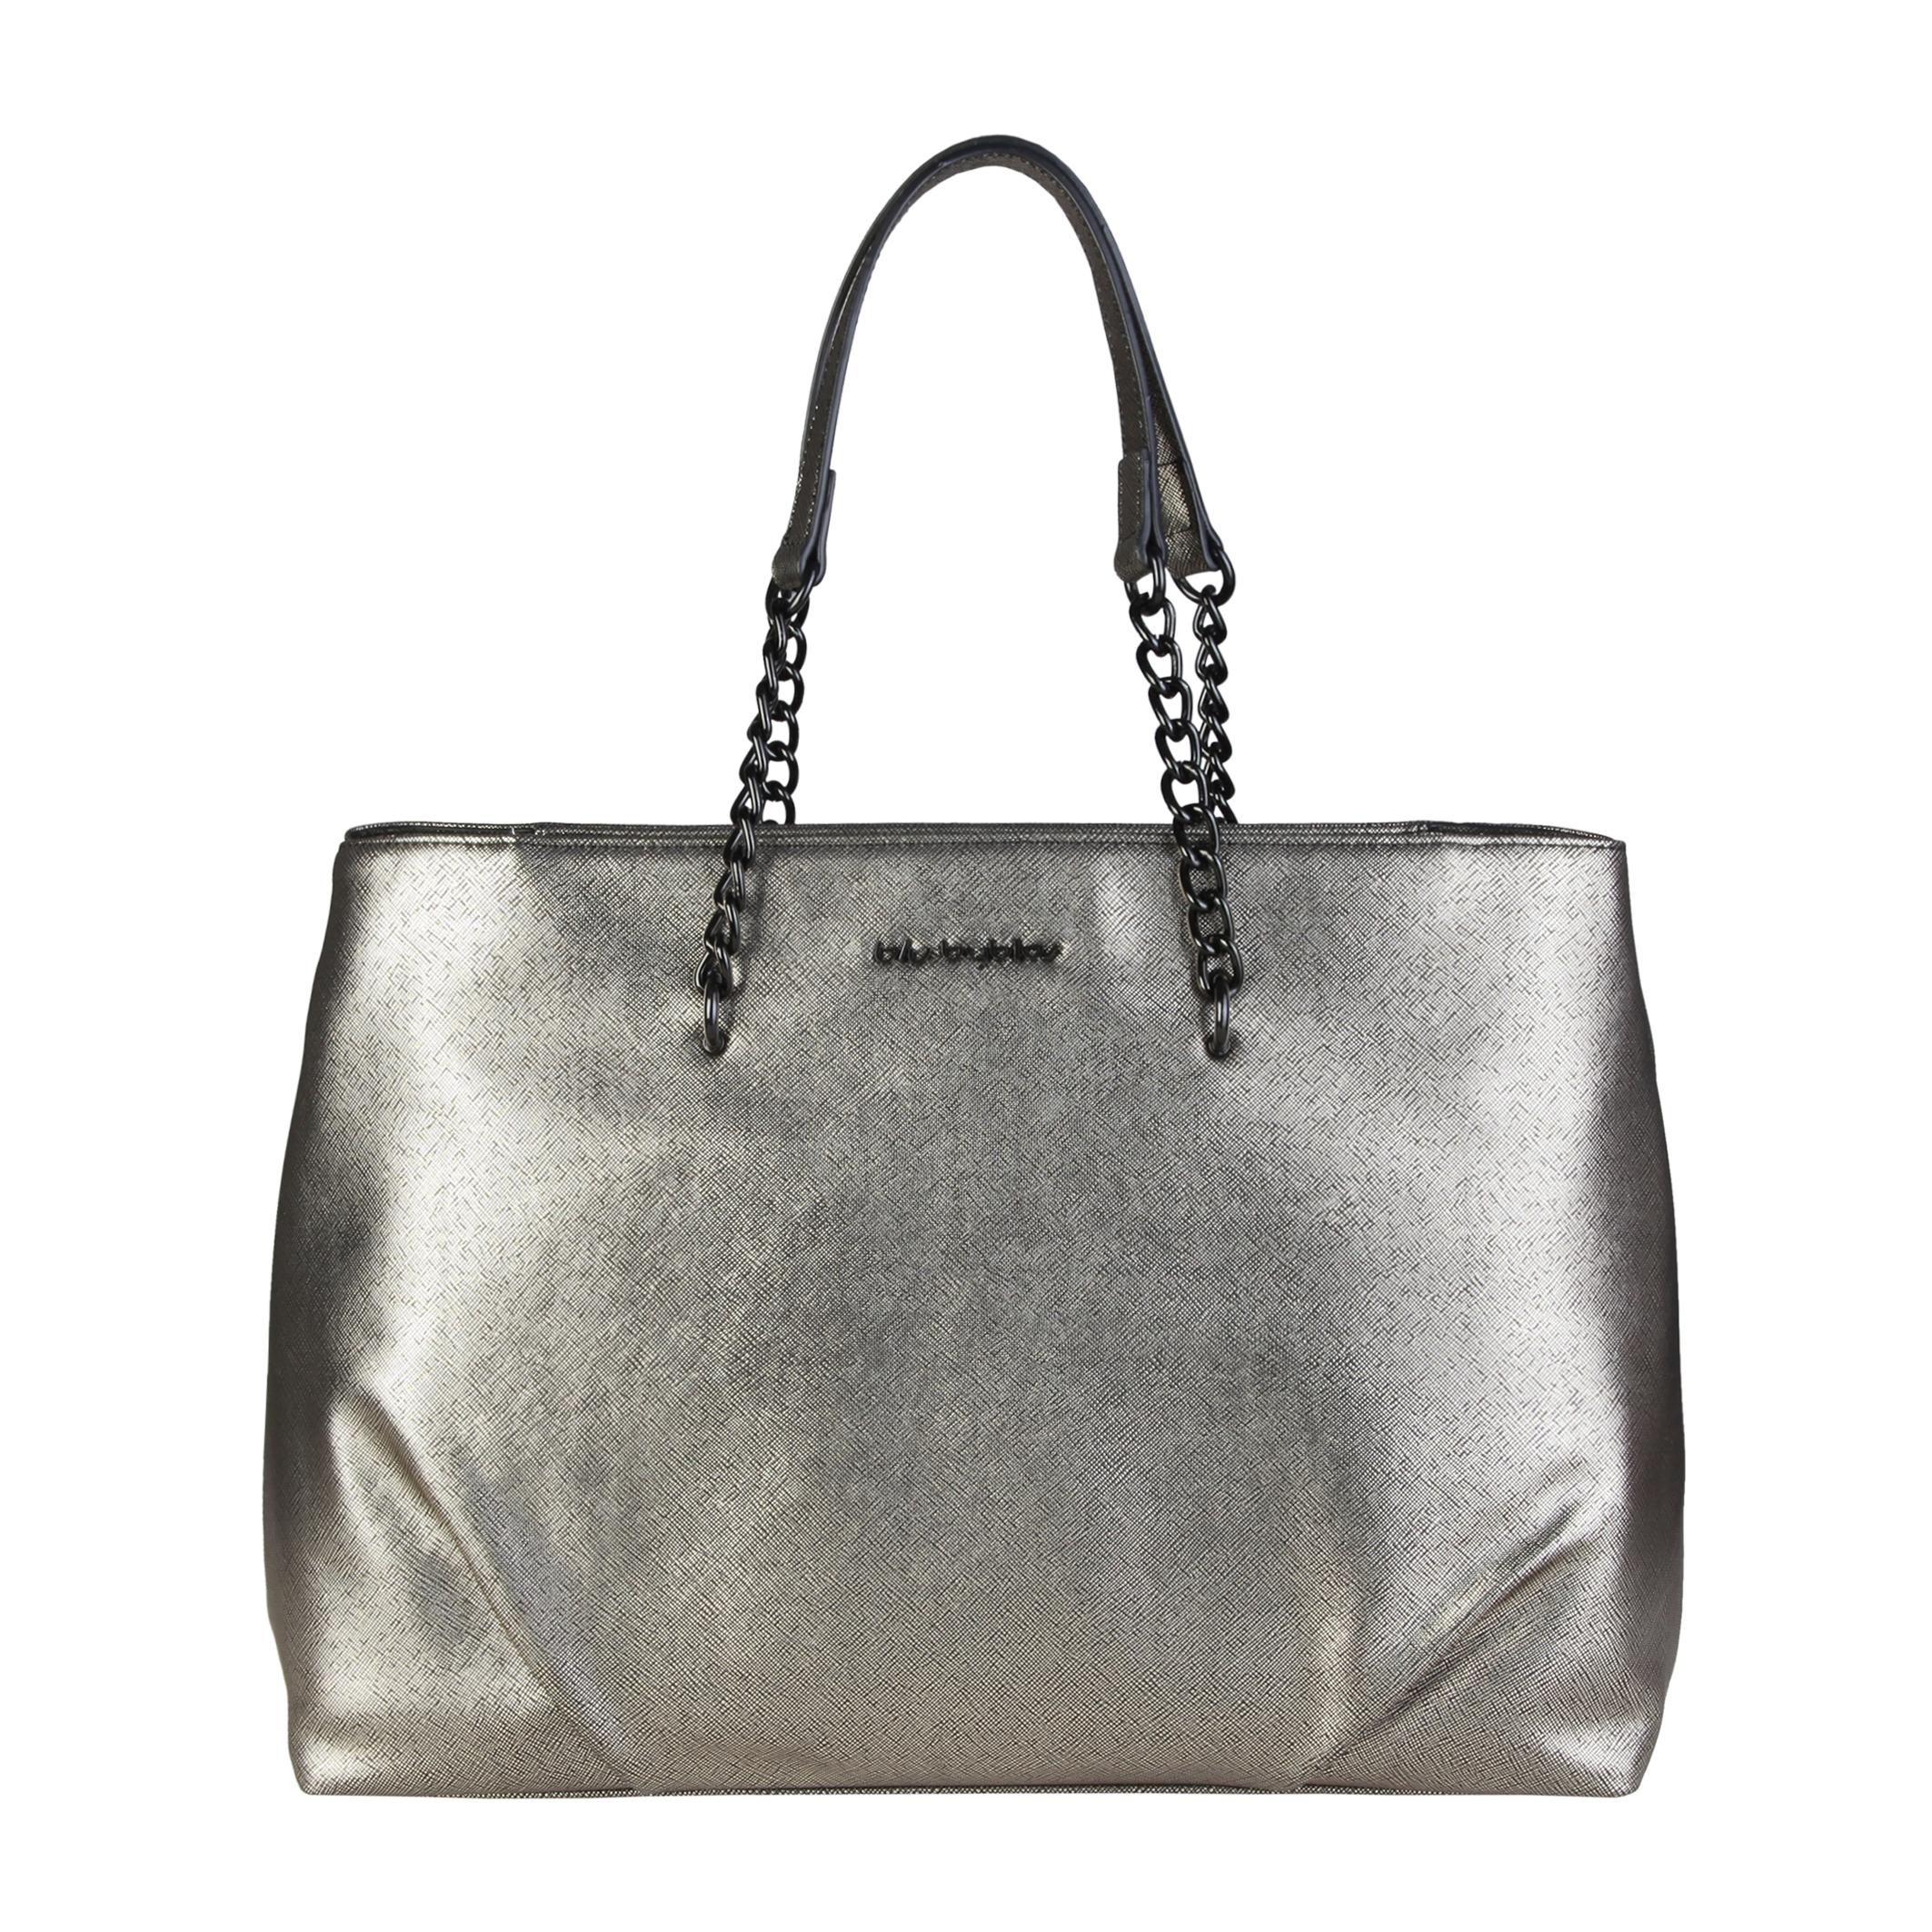 Shopping bag Blu Byblos PENC-WSAF_675P80 Donna Giallo 85941